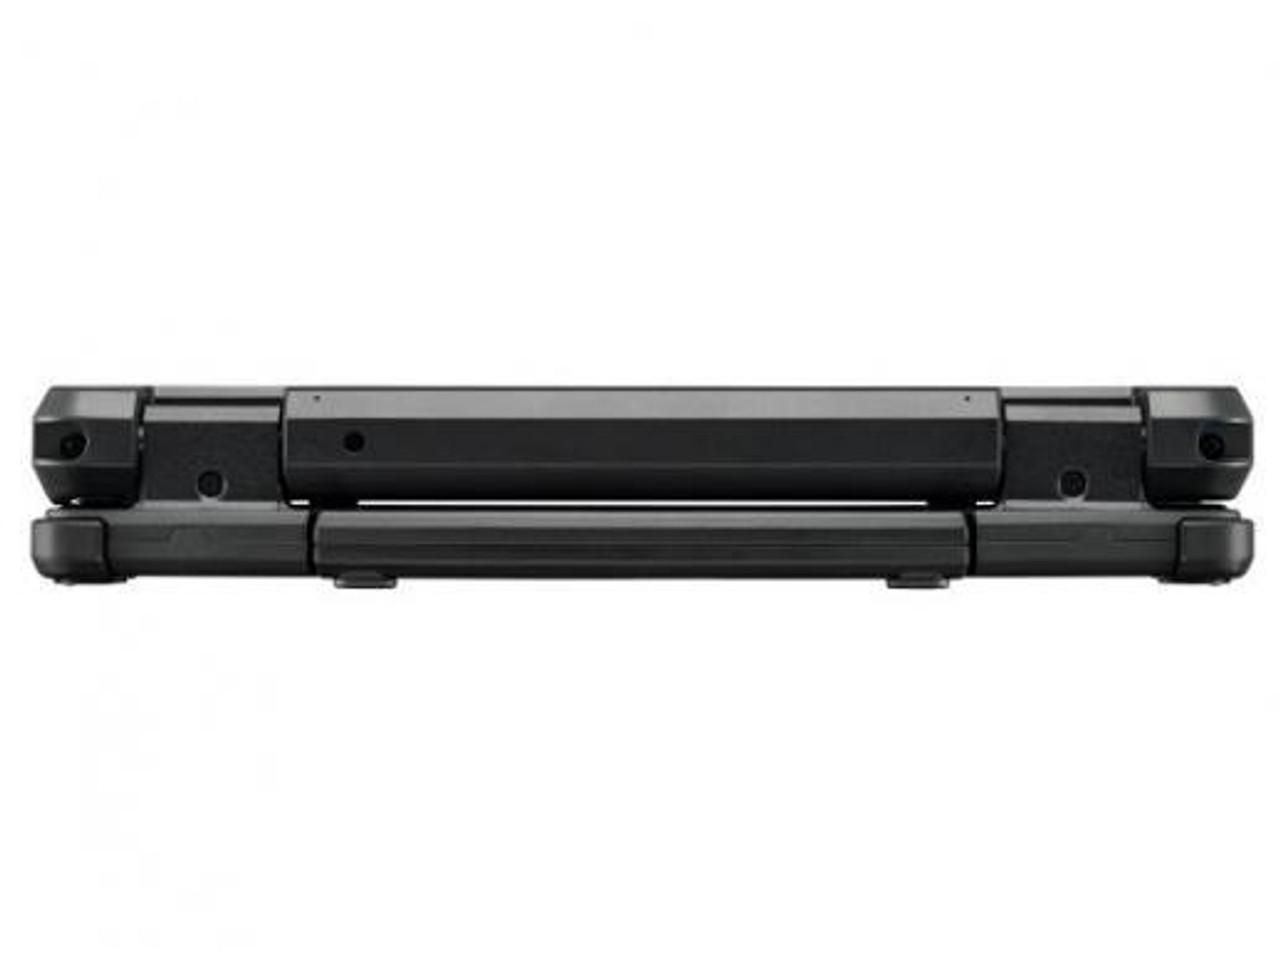 Panasonic CF-33 MK1 side 3